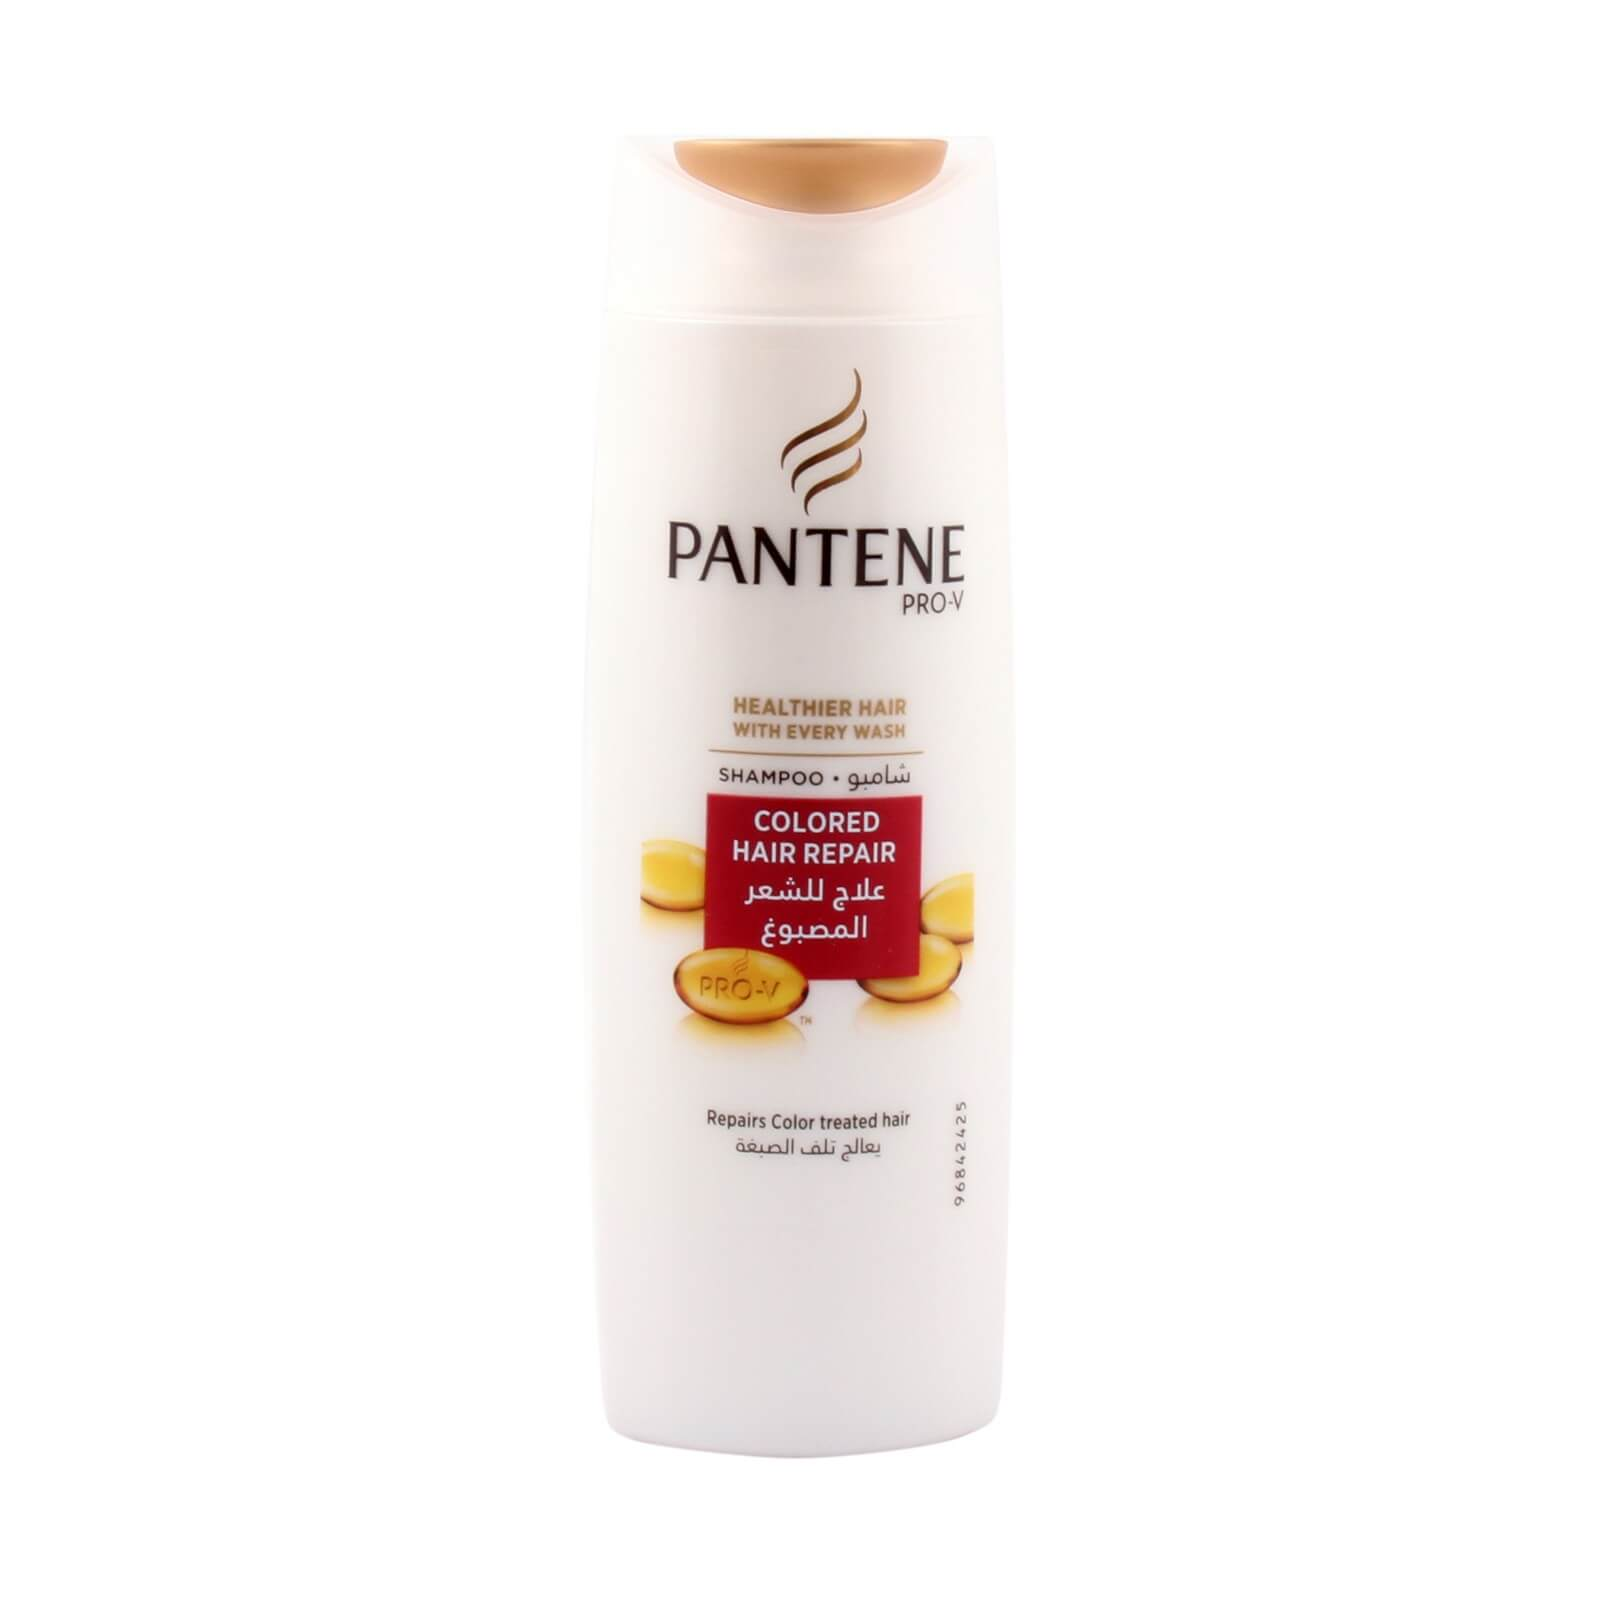 PANTENE SHAMPOO COLORED HAIR REPAIR 200ML